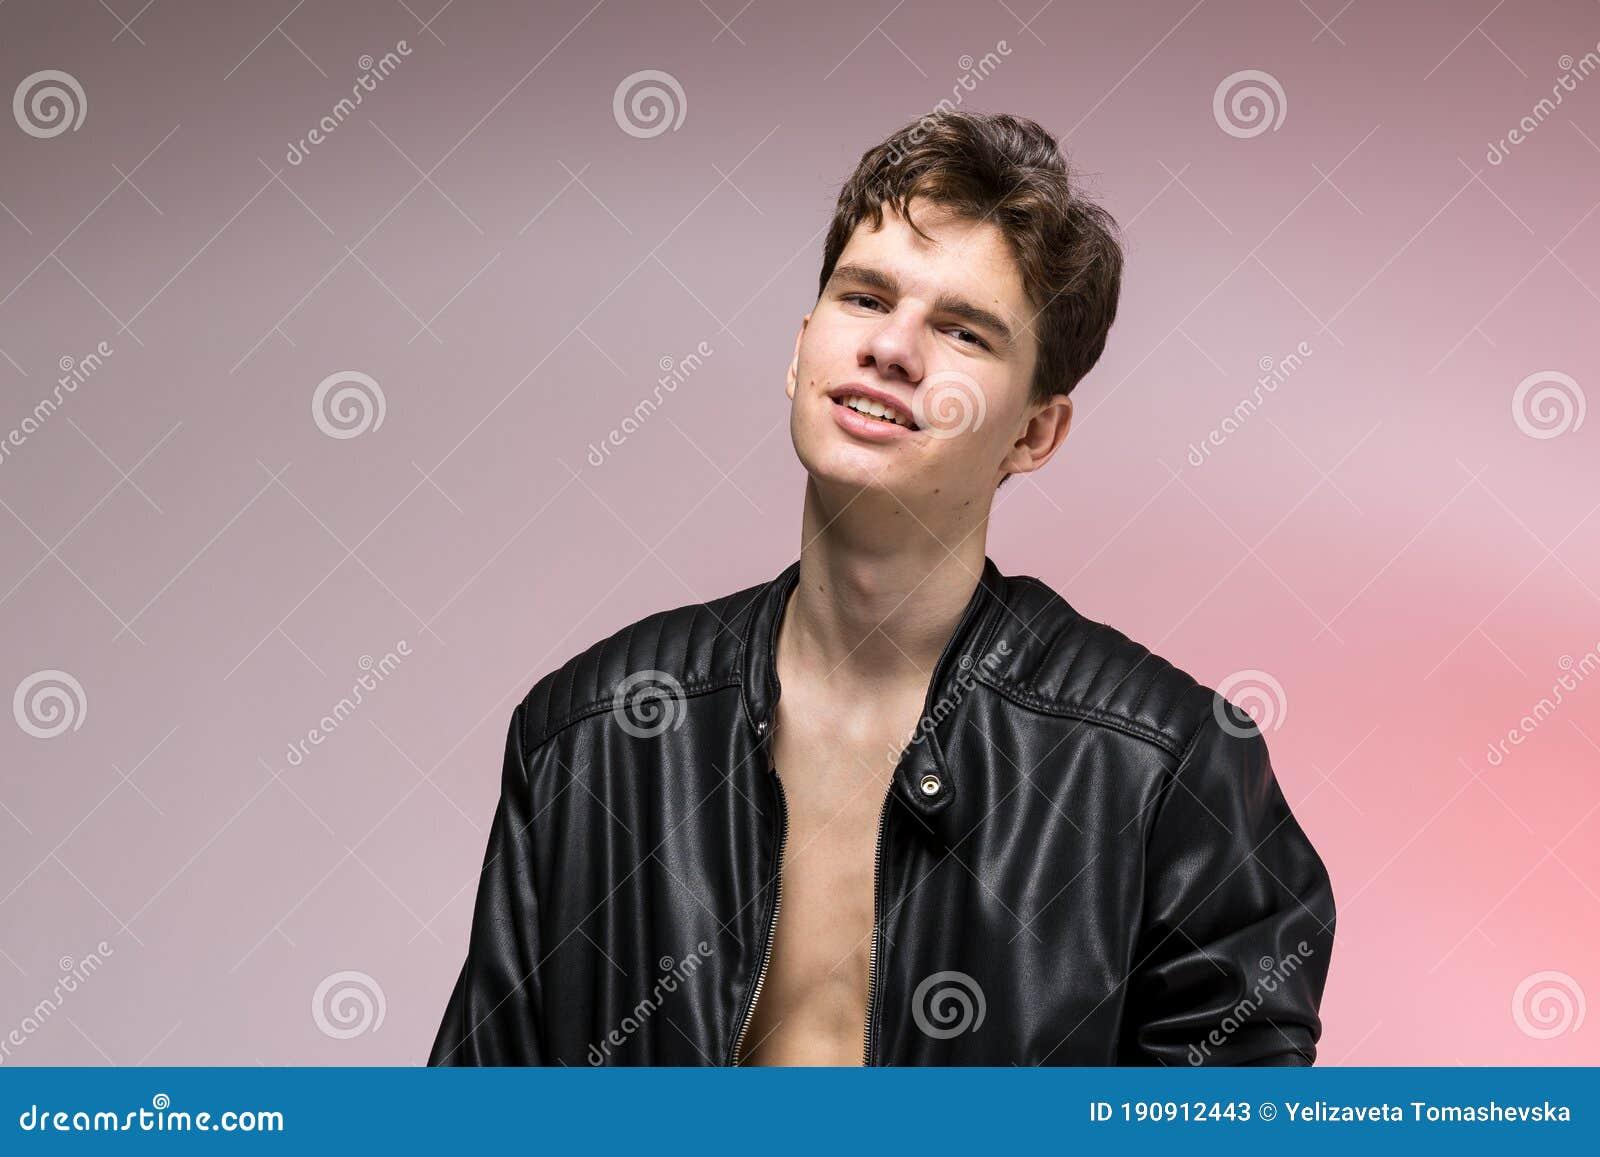 Boy model gay Gallery Archives